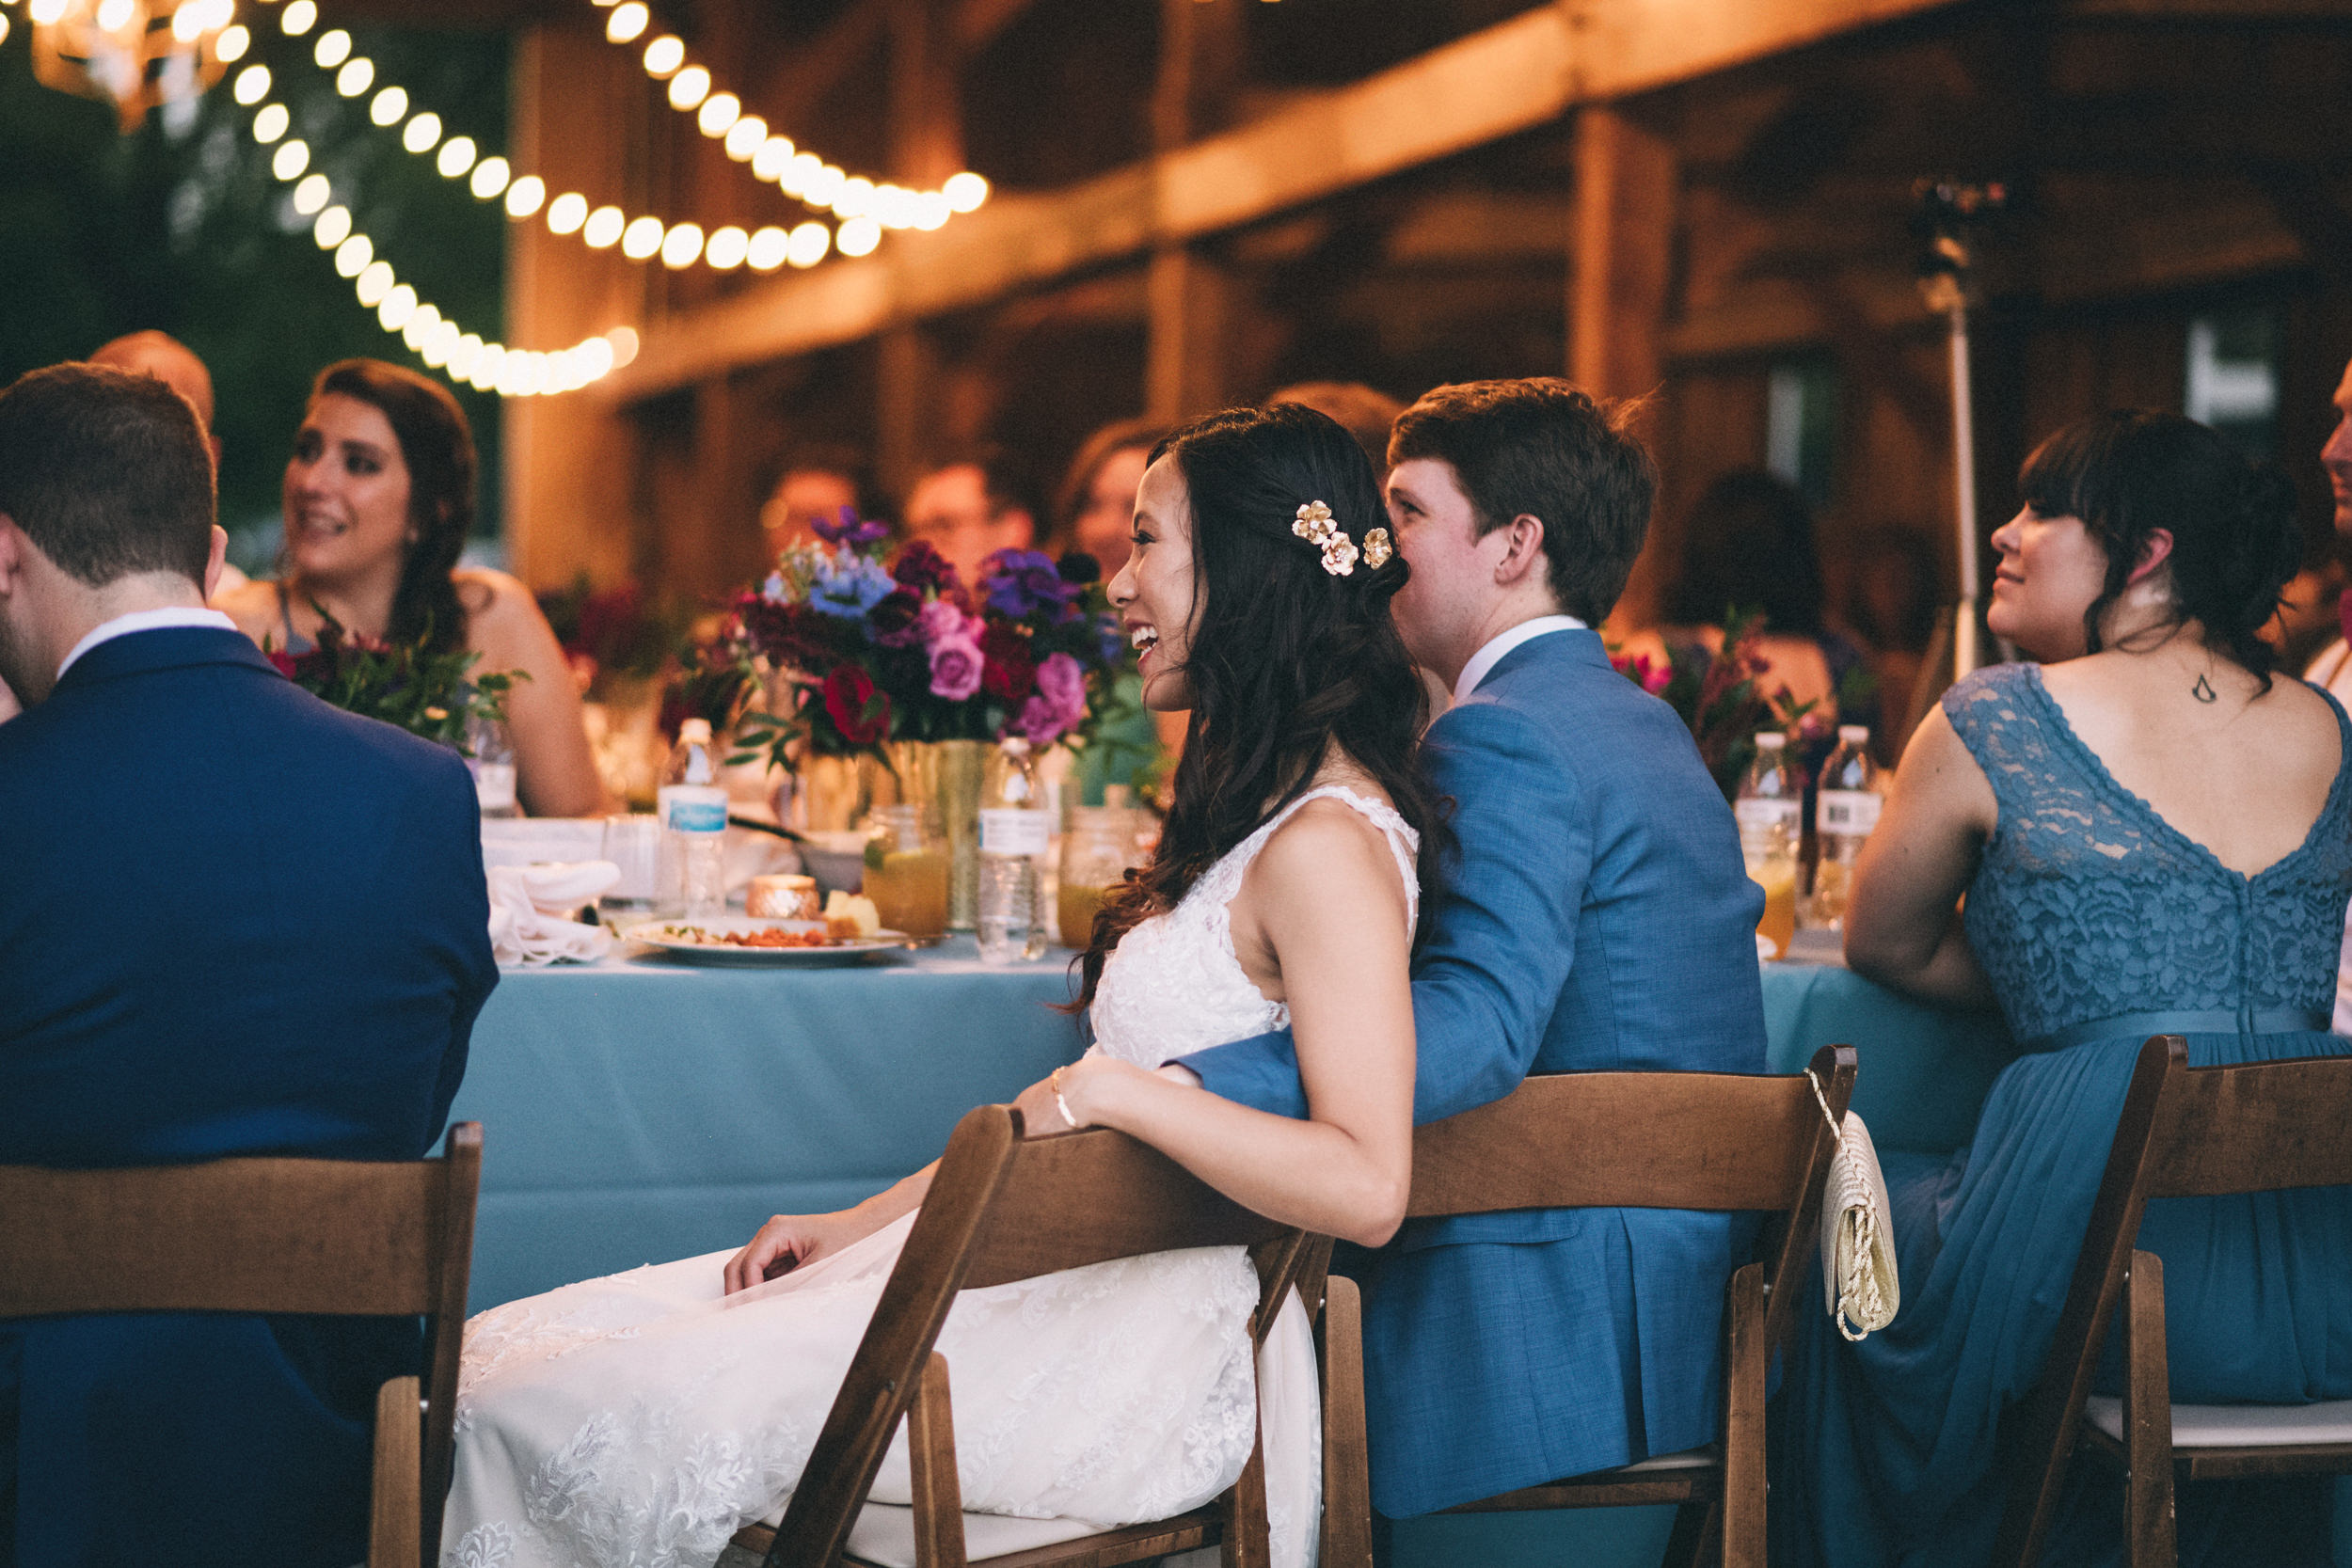 Louisville-Kentucky-Wedding-and-Elopement-Photographer-Sarah-Katherine-Davis-Photography-Summer-Jewel-Toned-Wedding-Chineese-Tea-Ceremony-Warrenwood-Manor-Danville-870.jpg